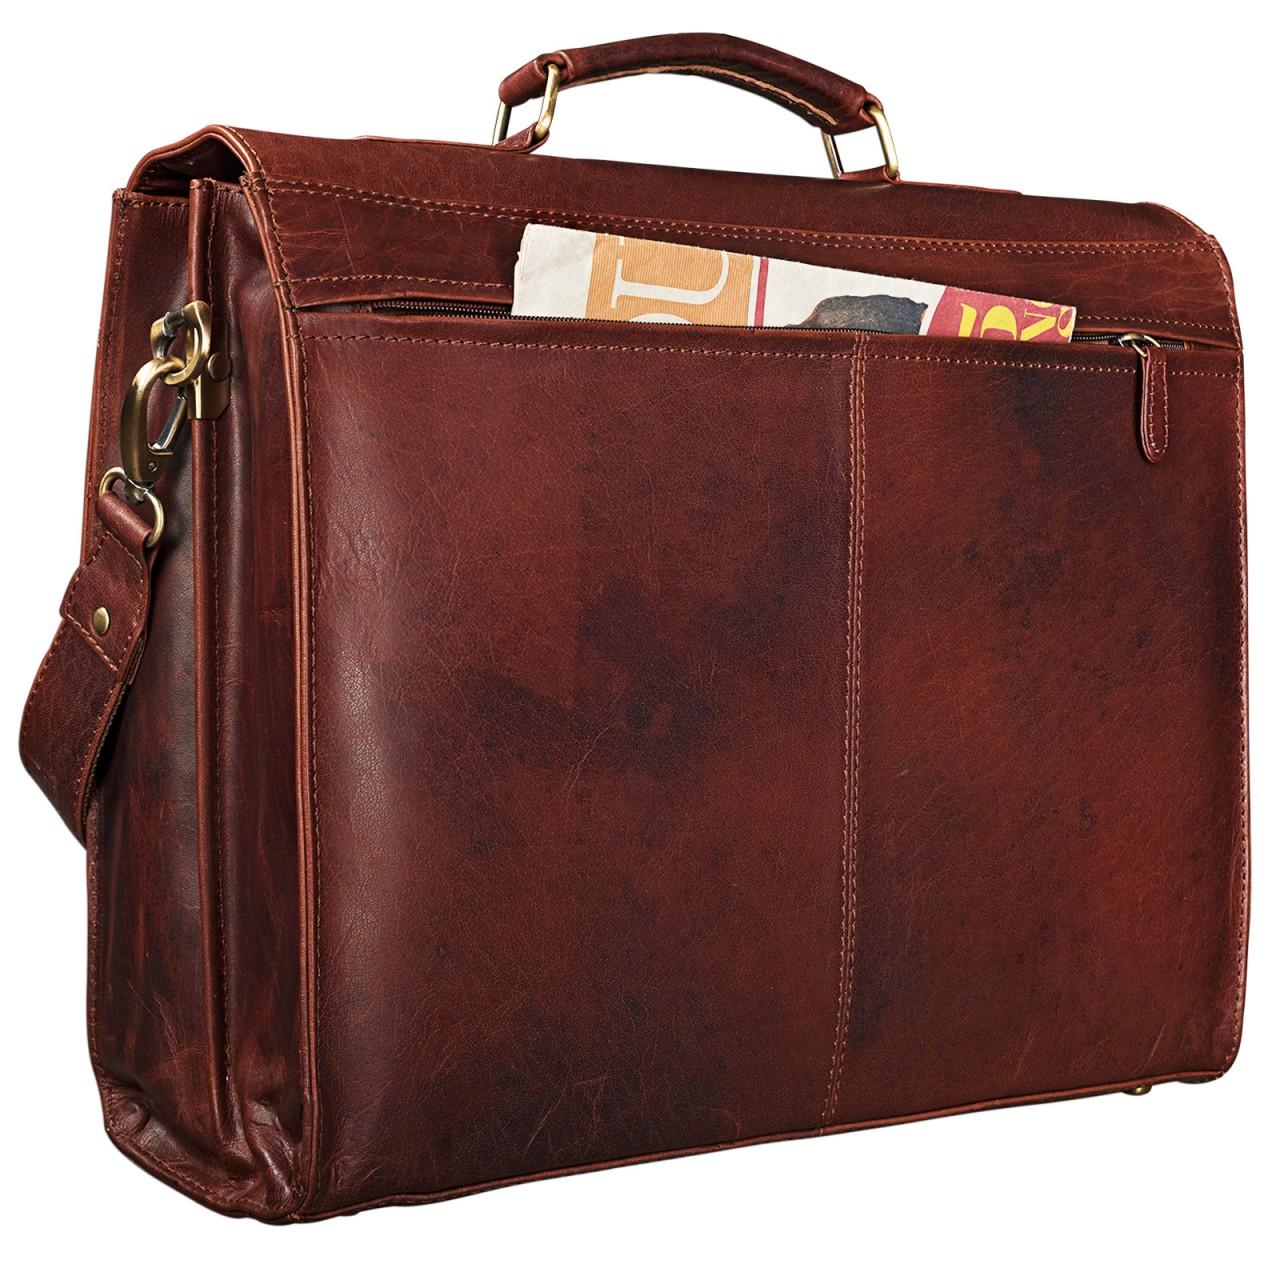 Unisex Businesstasche Leder